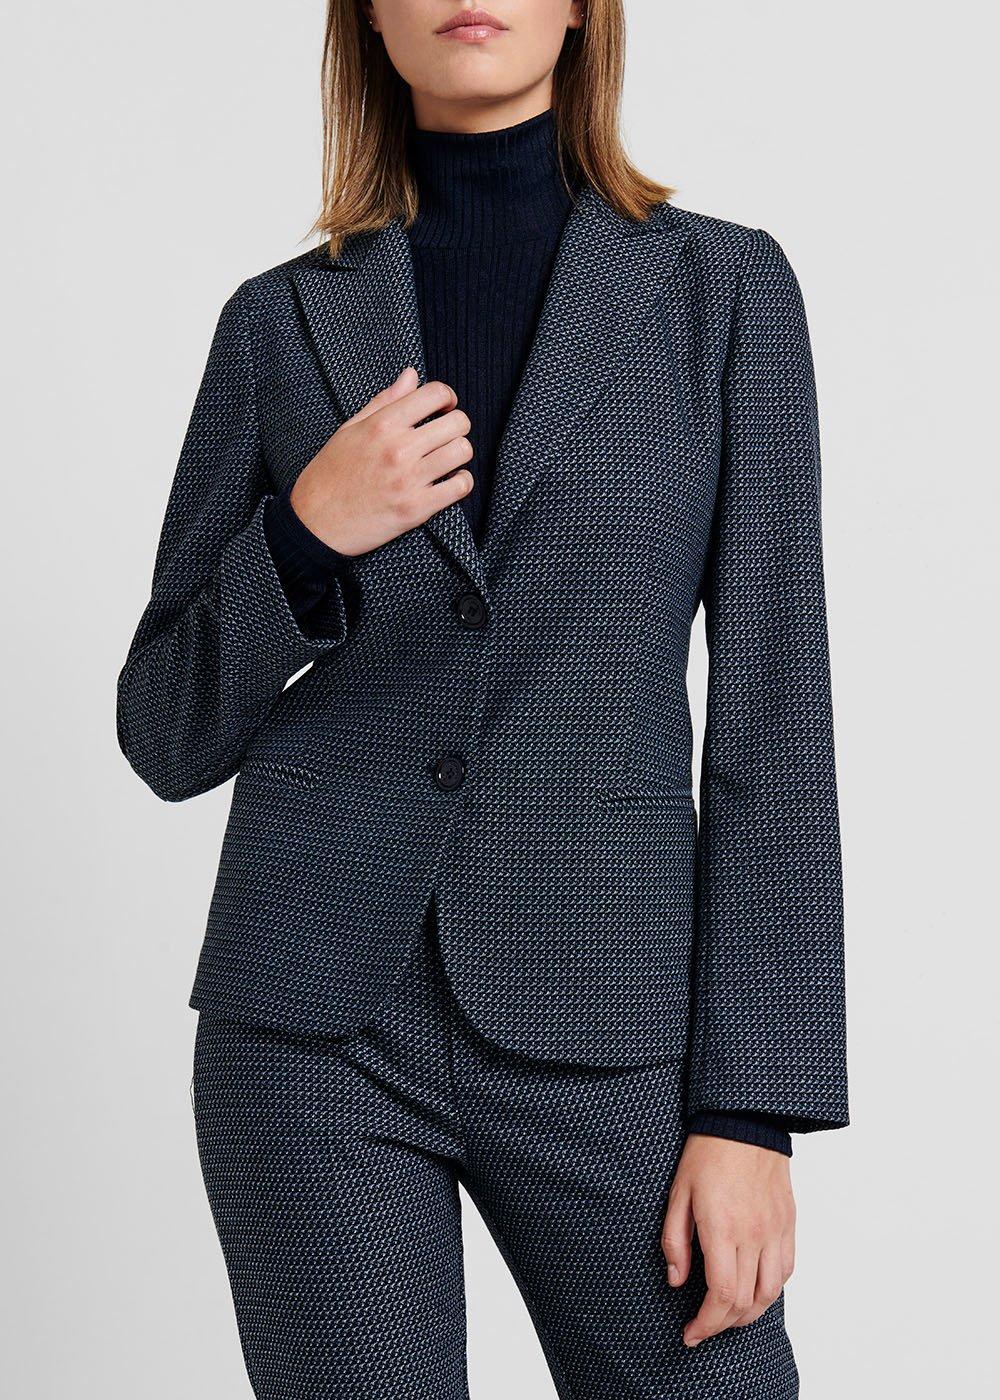 Micro-patterned jacquard jacket - Blue / Black Fantasia - Woman